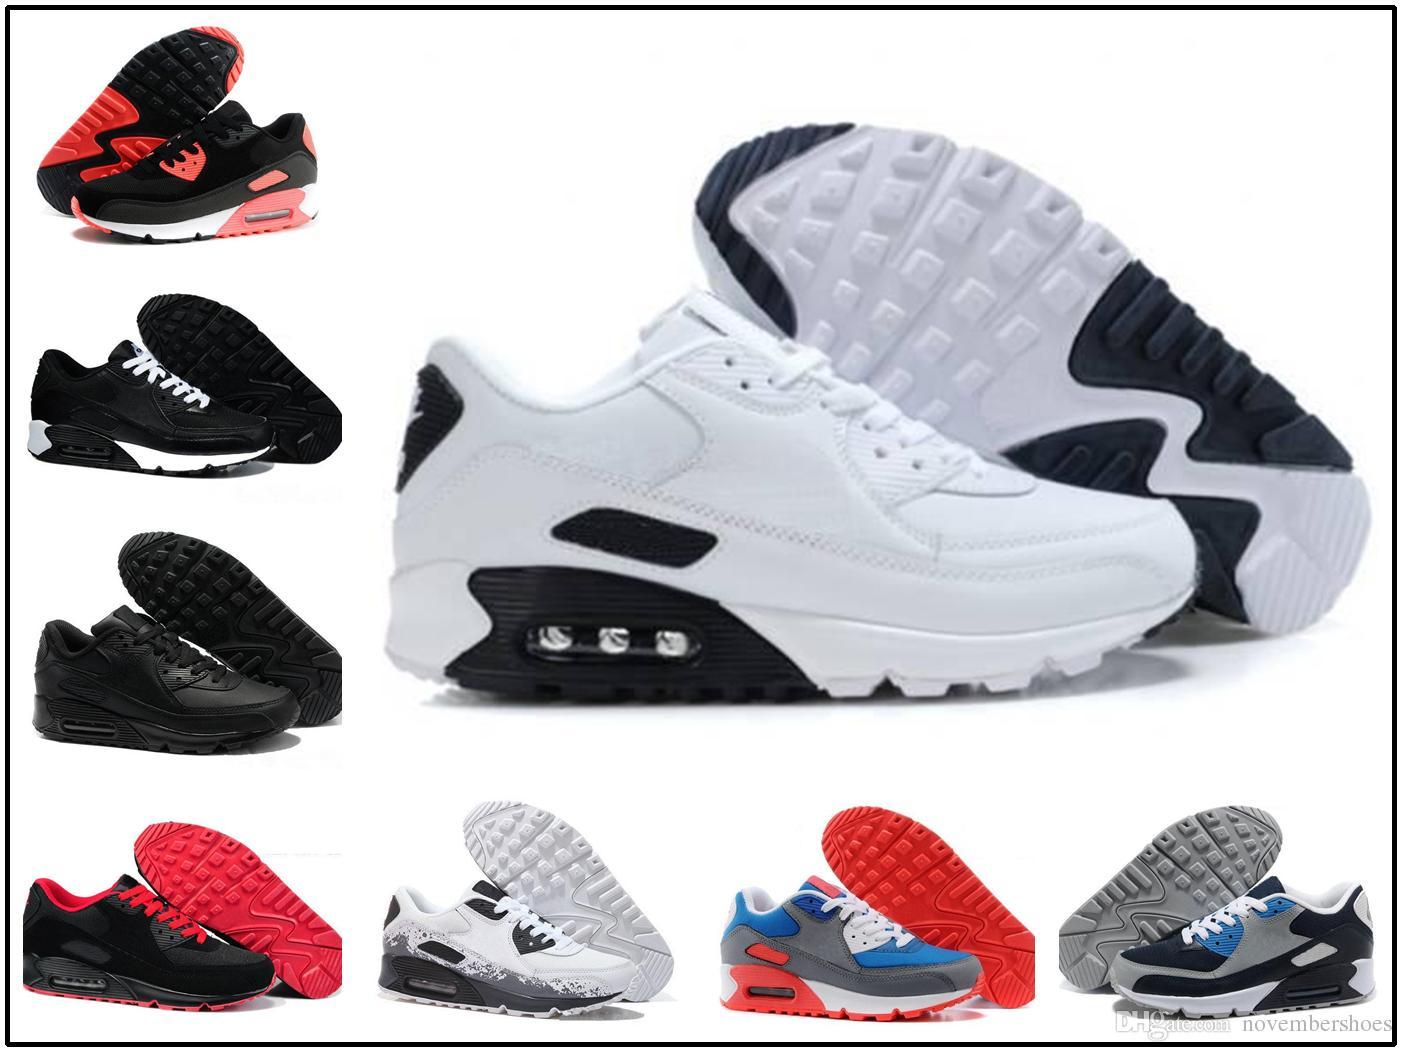 nike air max airmax 90 deporte para hombre zapatos clásicos hombres mujeres zapatillas negro rojo blanco entrenador deportivo superficie de colchón de